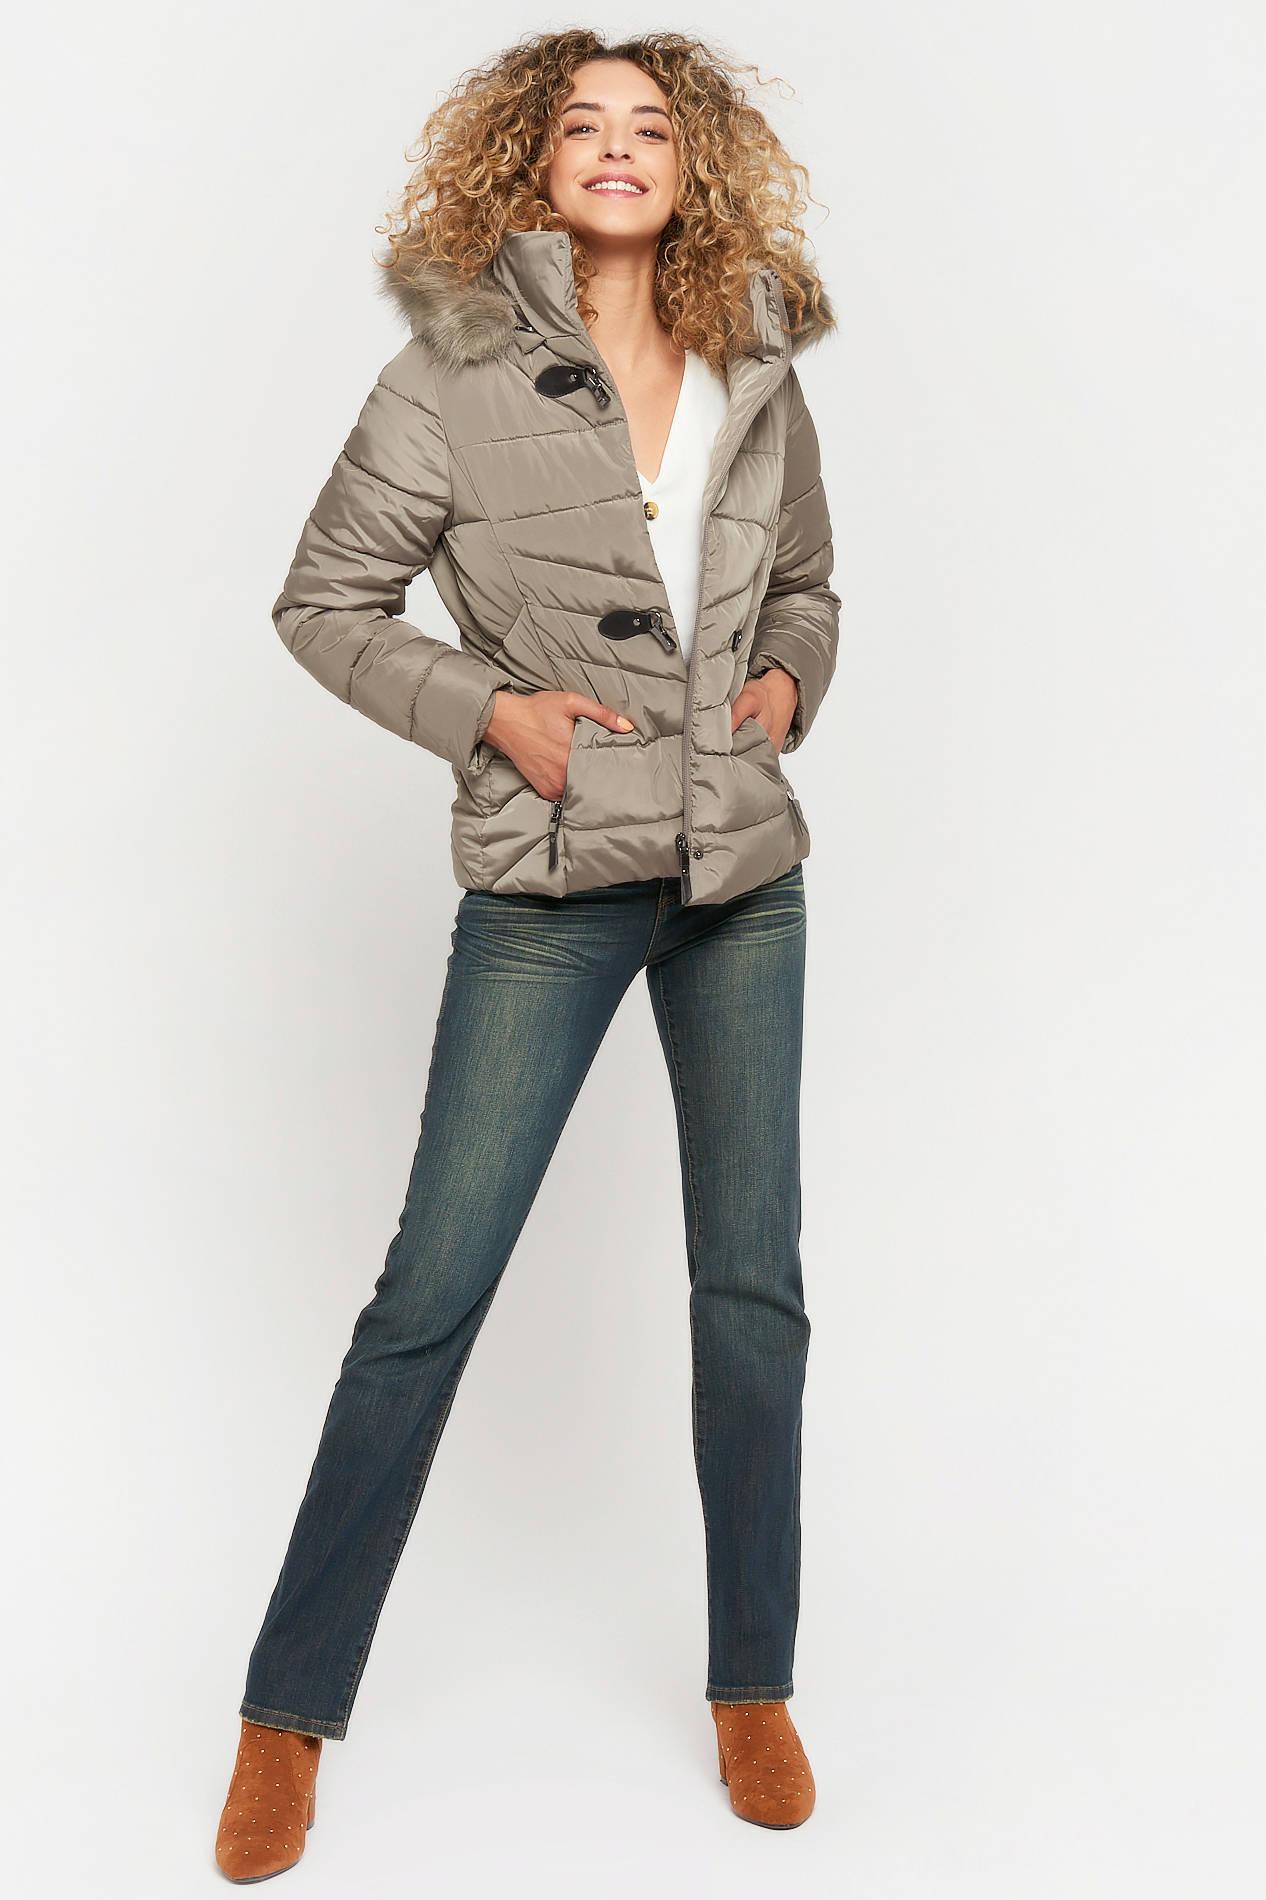 LOLALIZA gewatteerde jas grey taupe   wehkamp